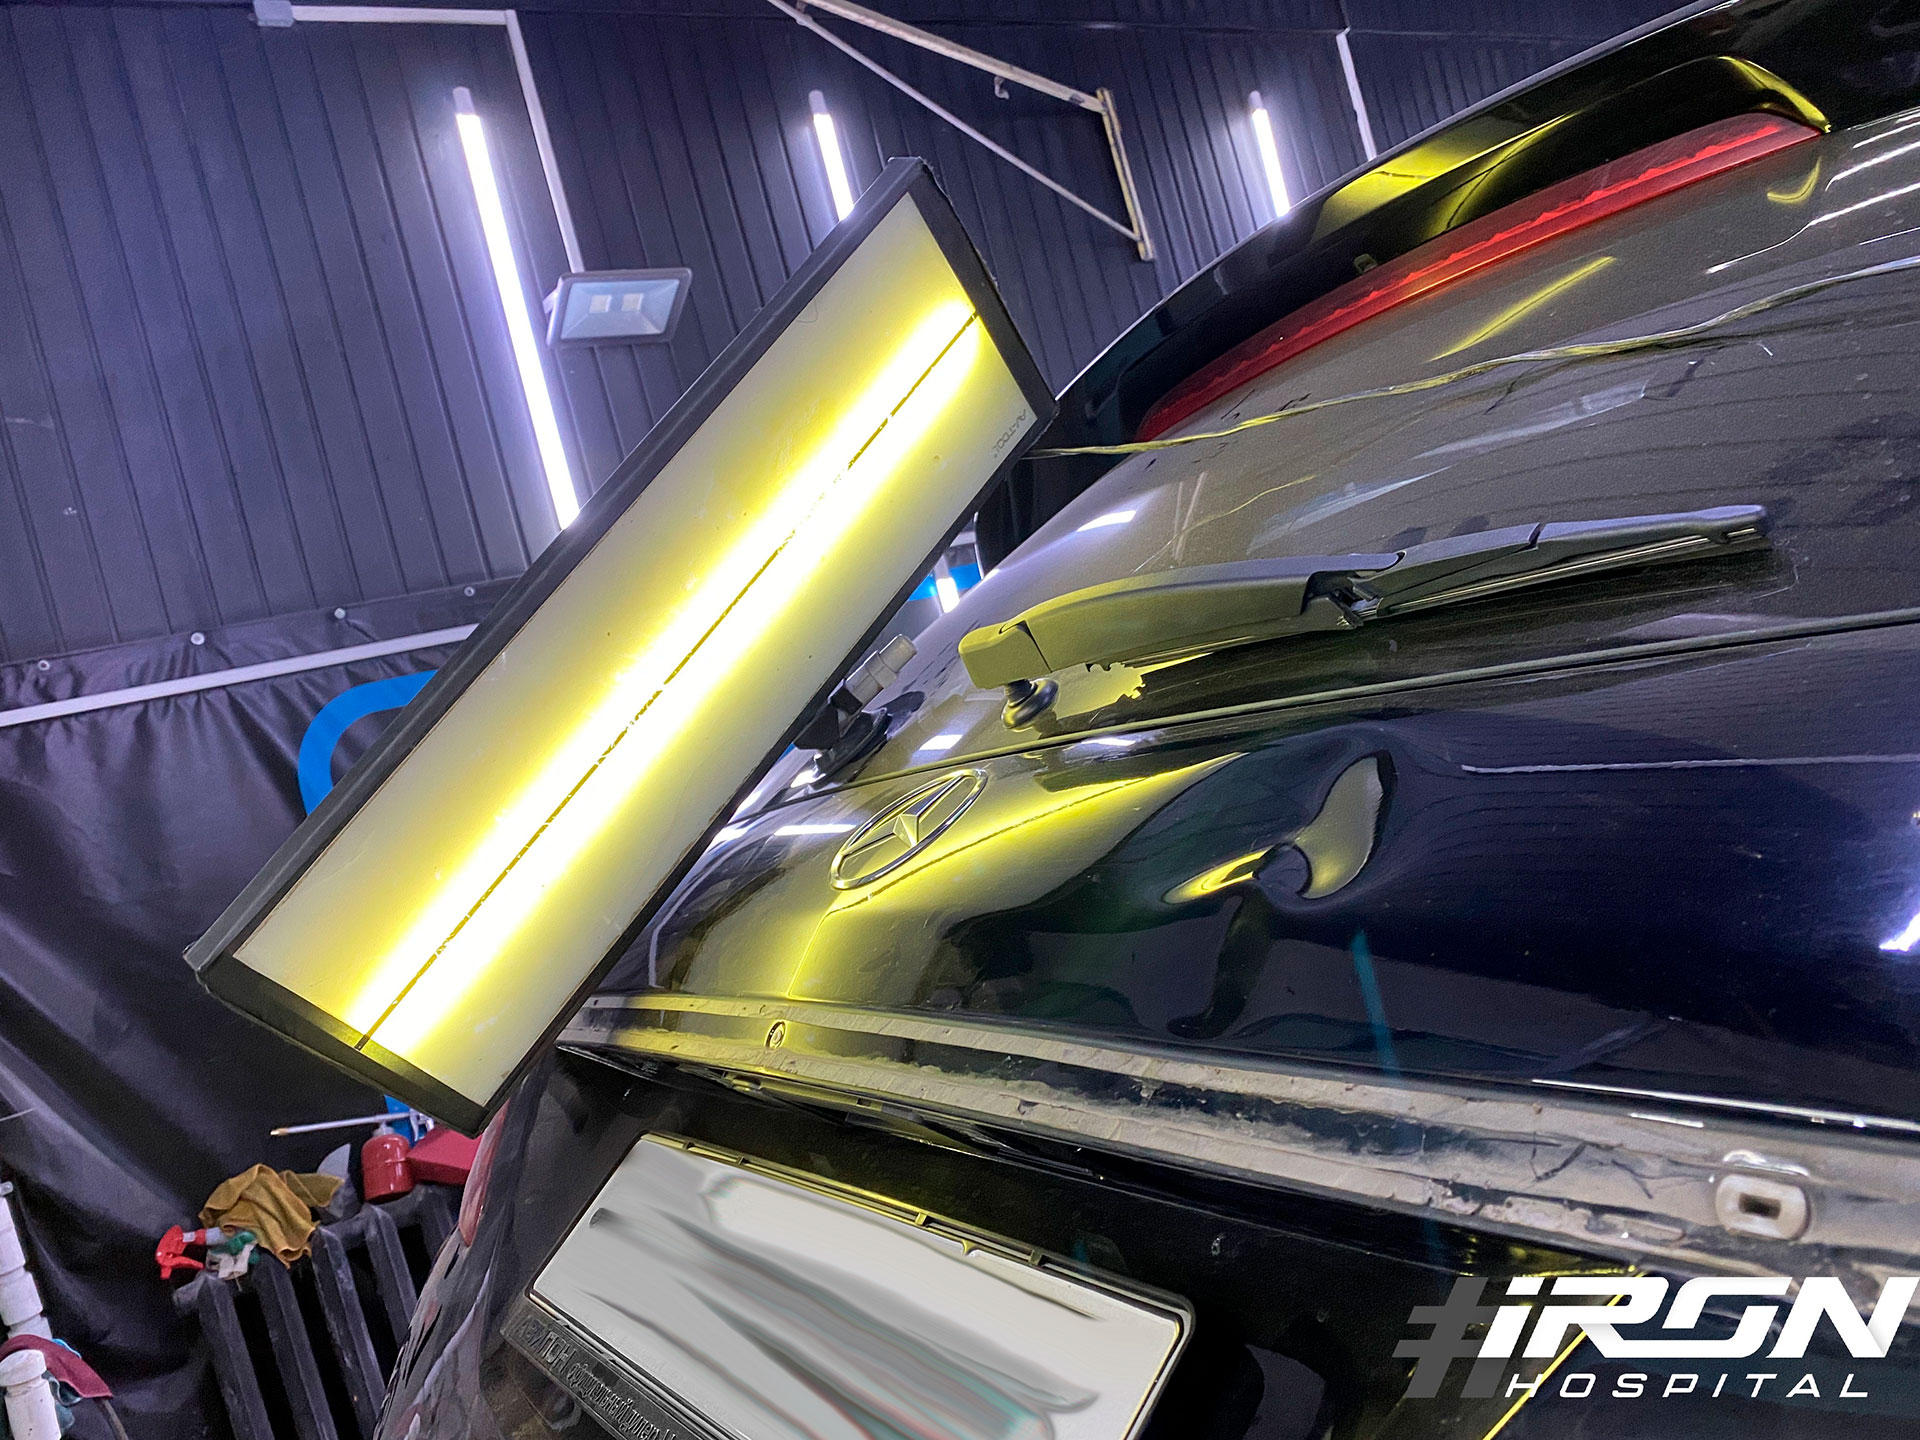 Выпрямление без окраса вмятин на крышке багажника Mercedes